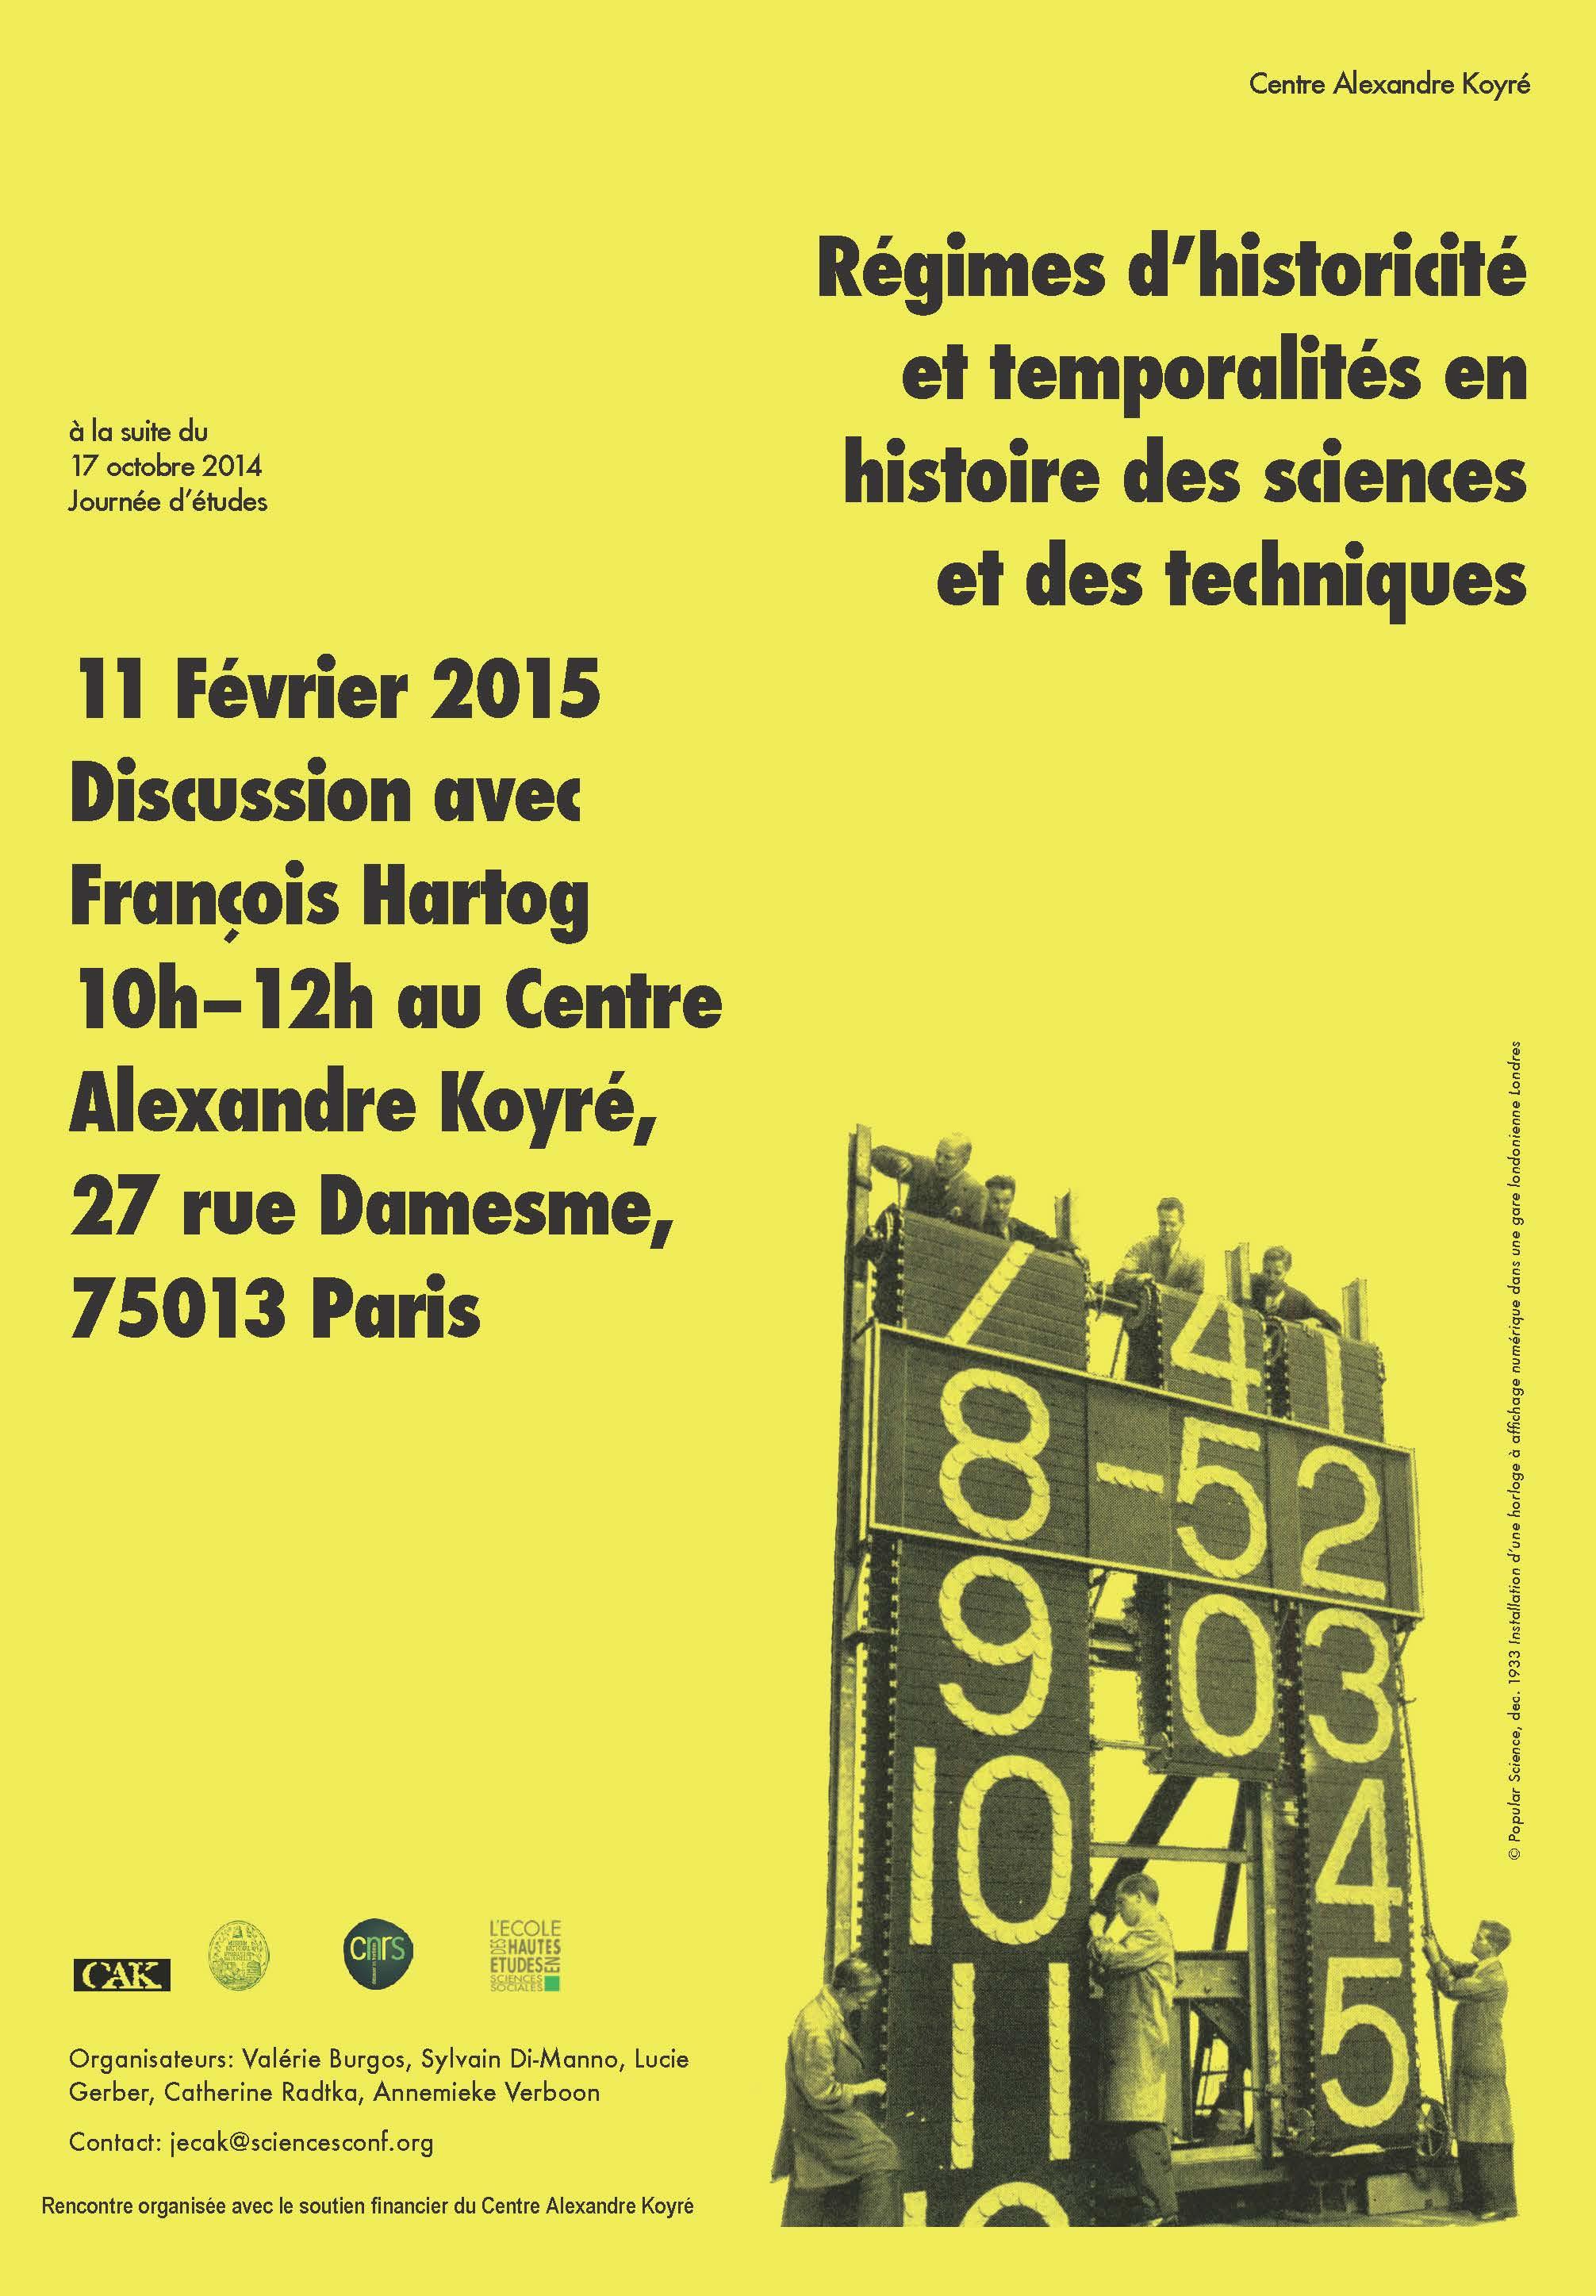 Historicite_Temporalites_dialogue_Hartog_11_fev_2015_version_financement_CAK_1.jpg